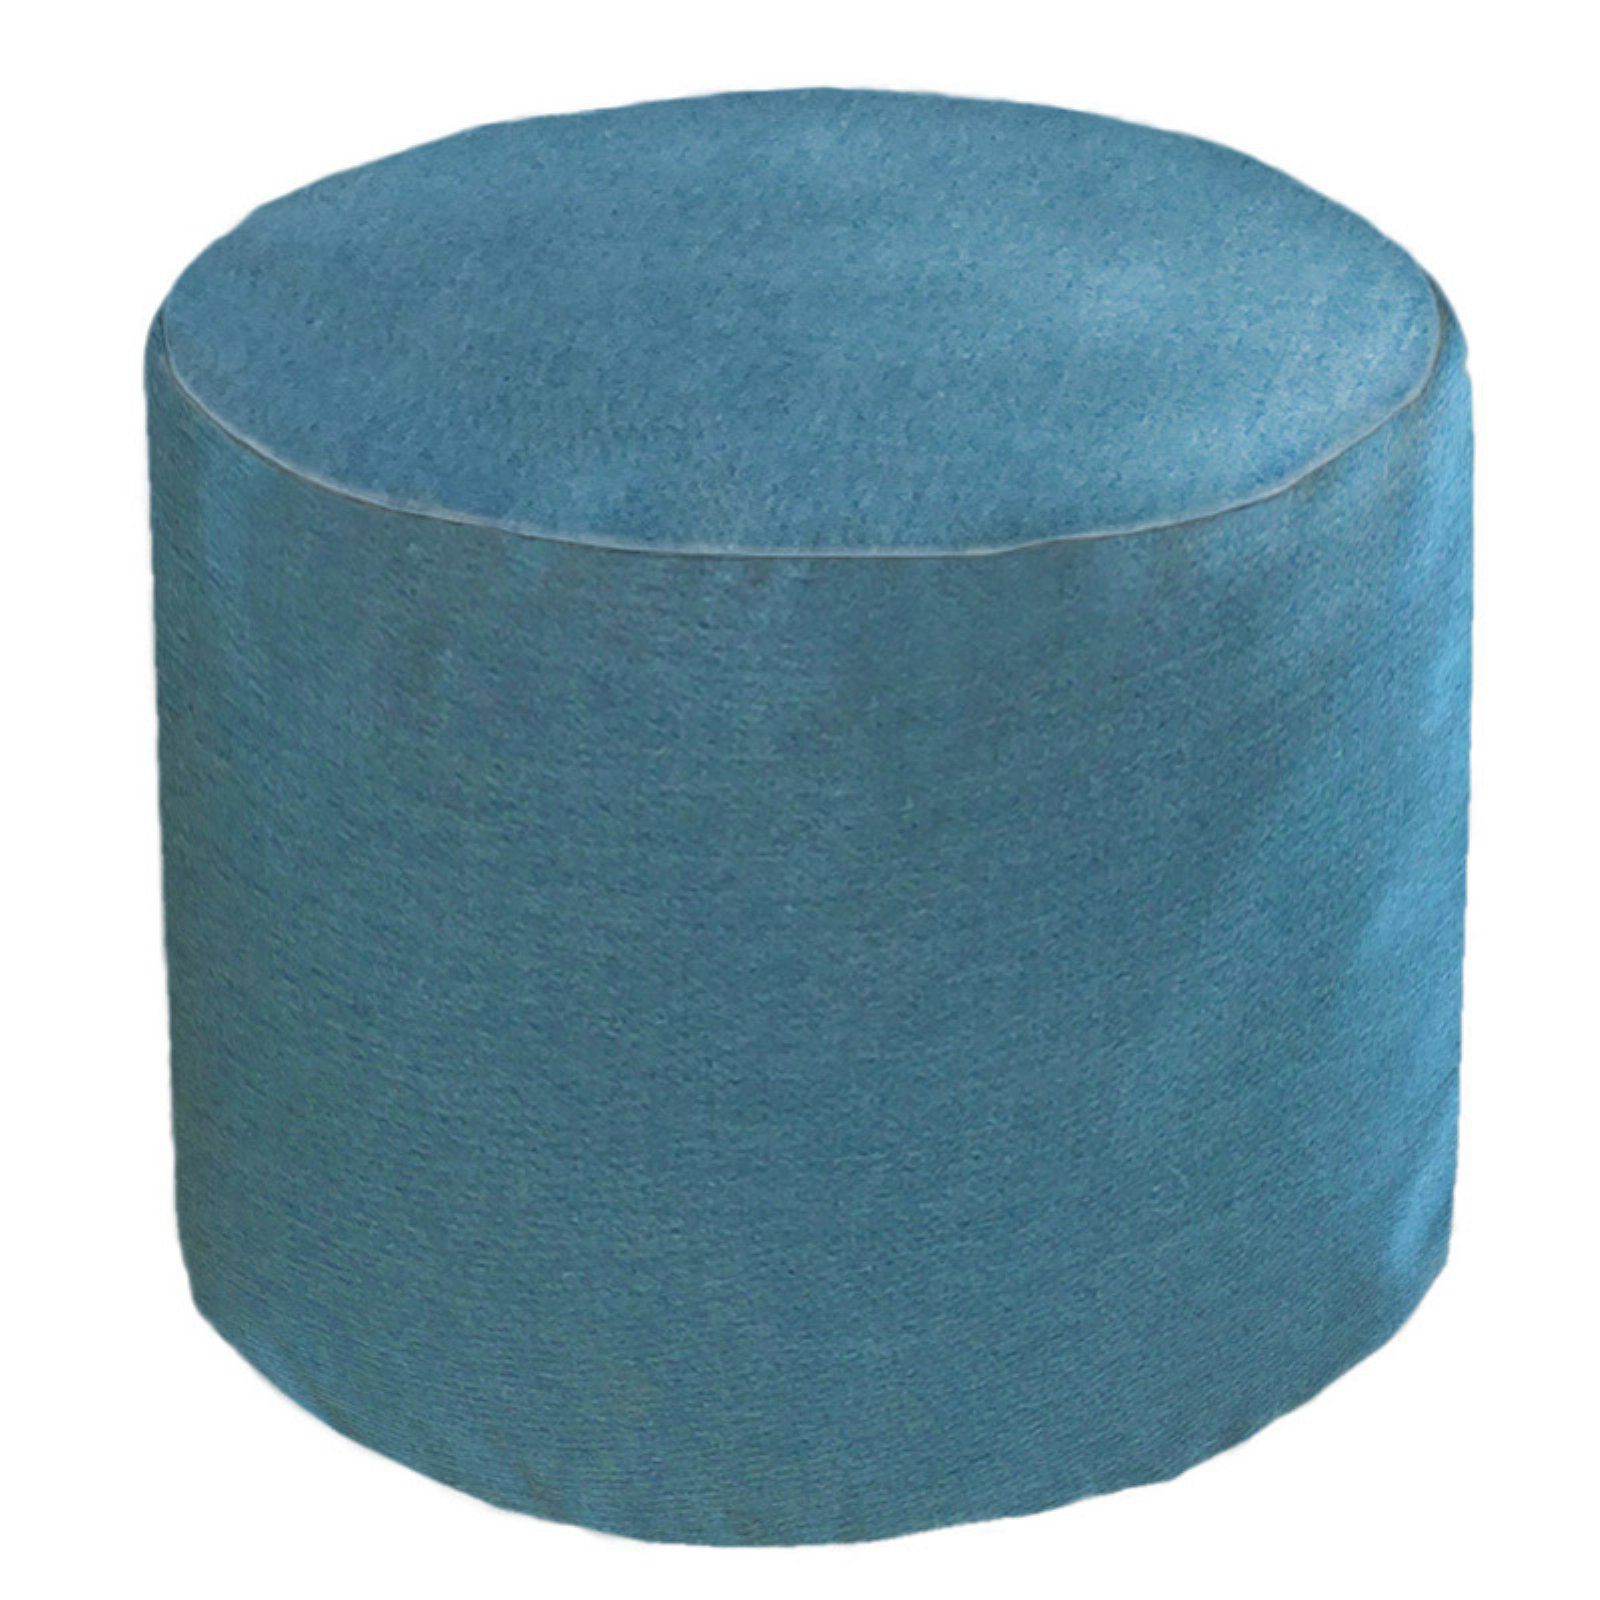 Remarkable Core Covers Outdoor Indoor 22 In Round Sunbrella Pouf Cast Machost Co Dining Chair Design Ideas Machostcouk